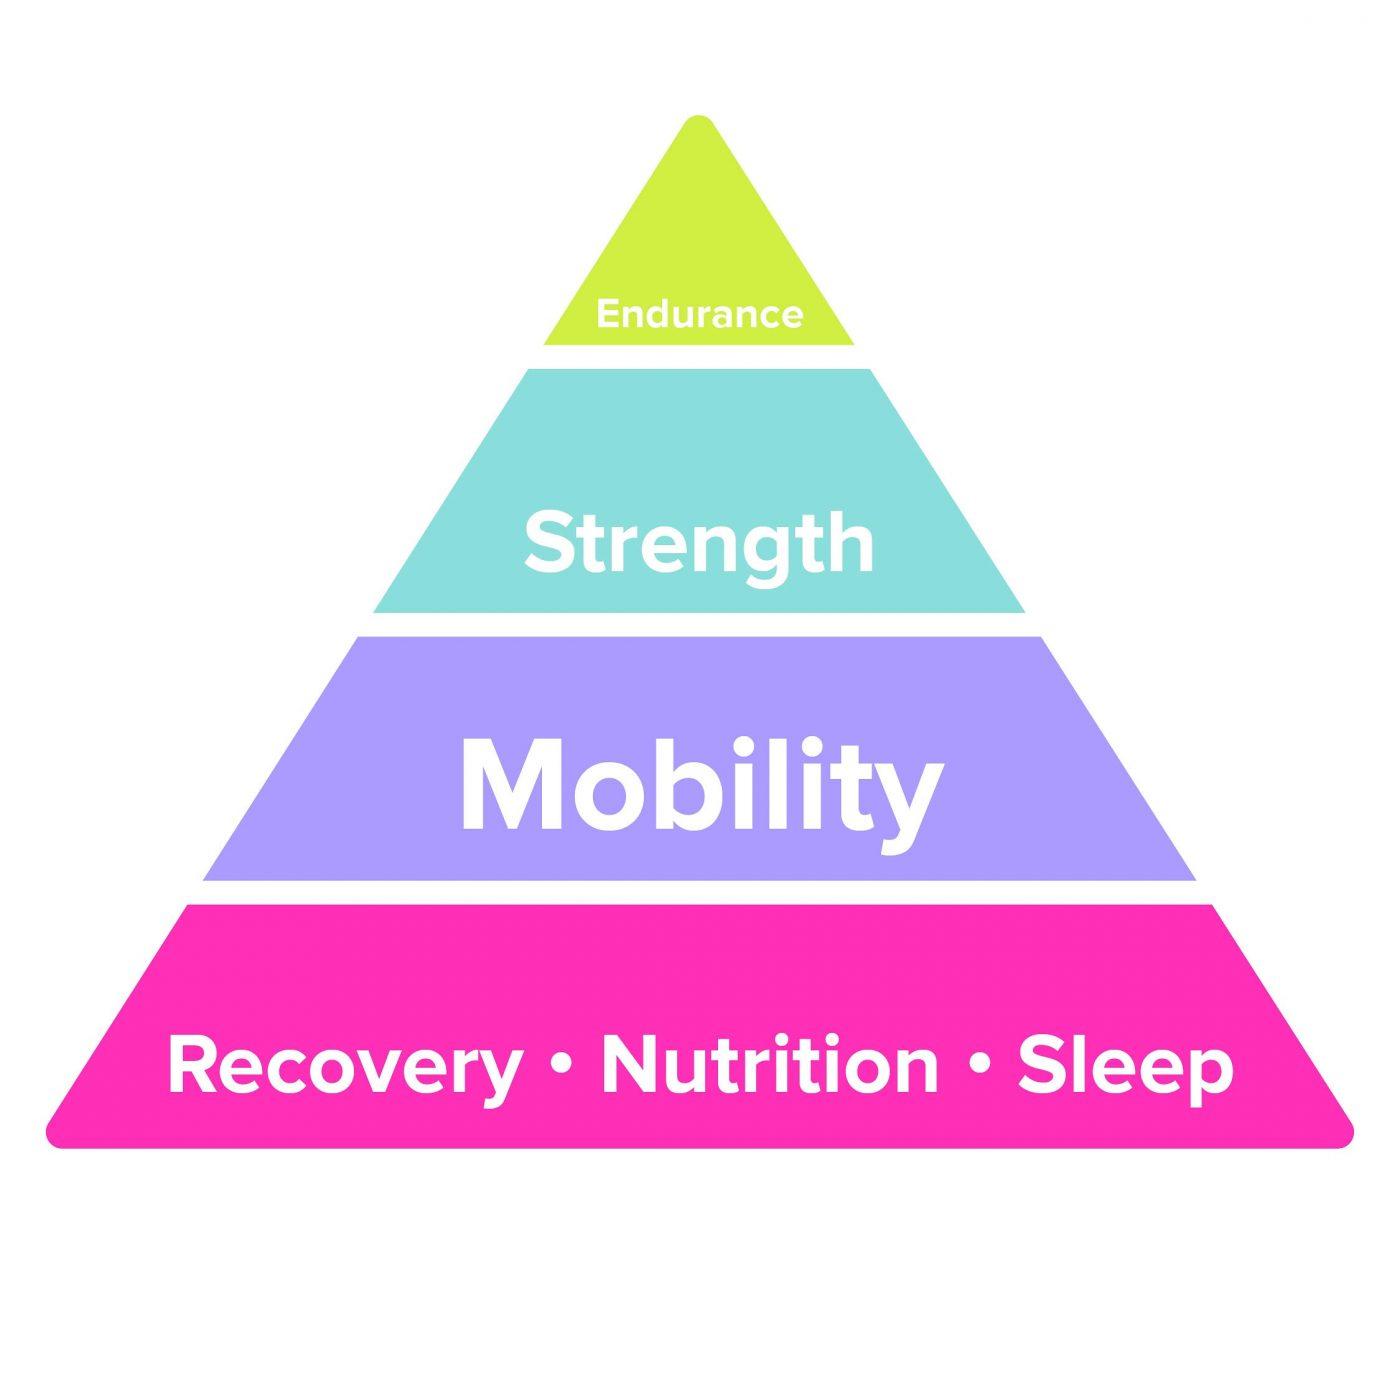 The Wellness Pyramid